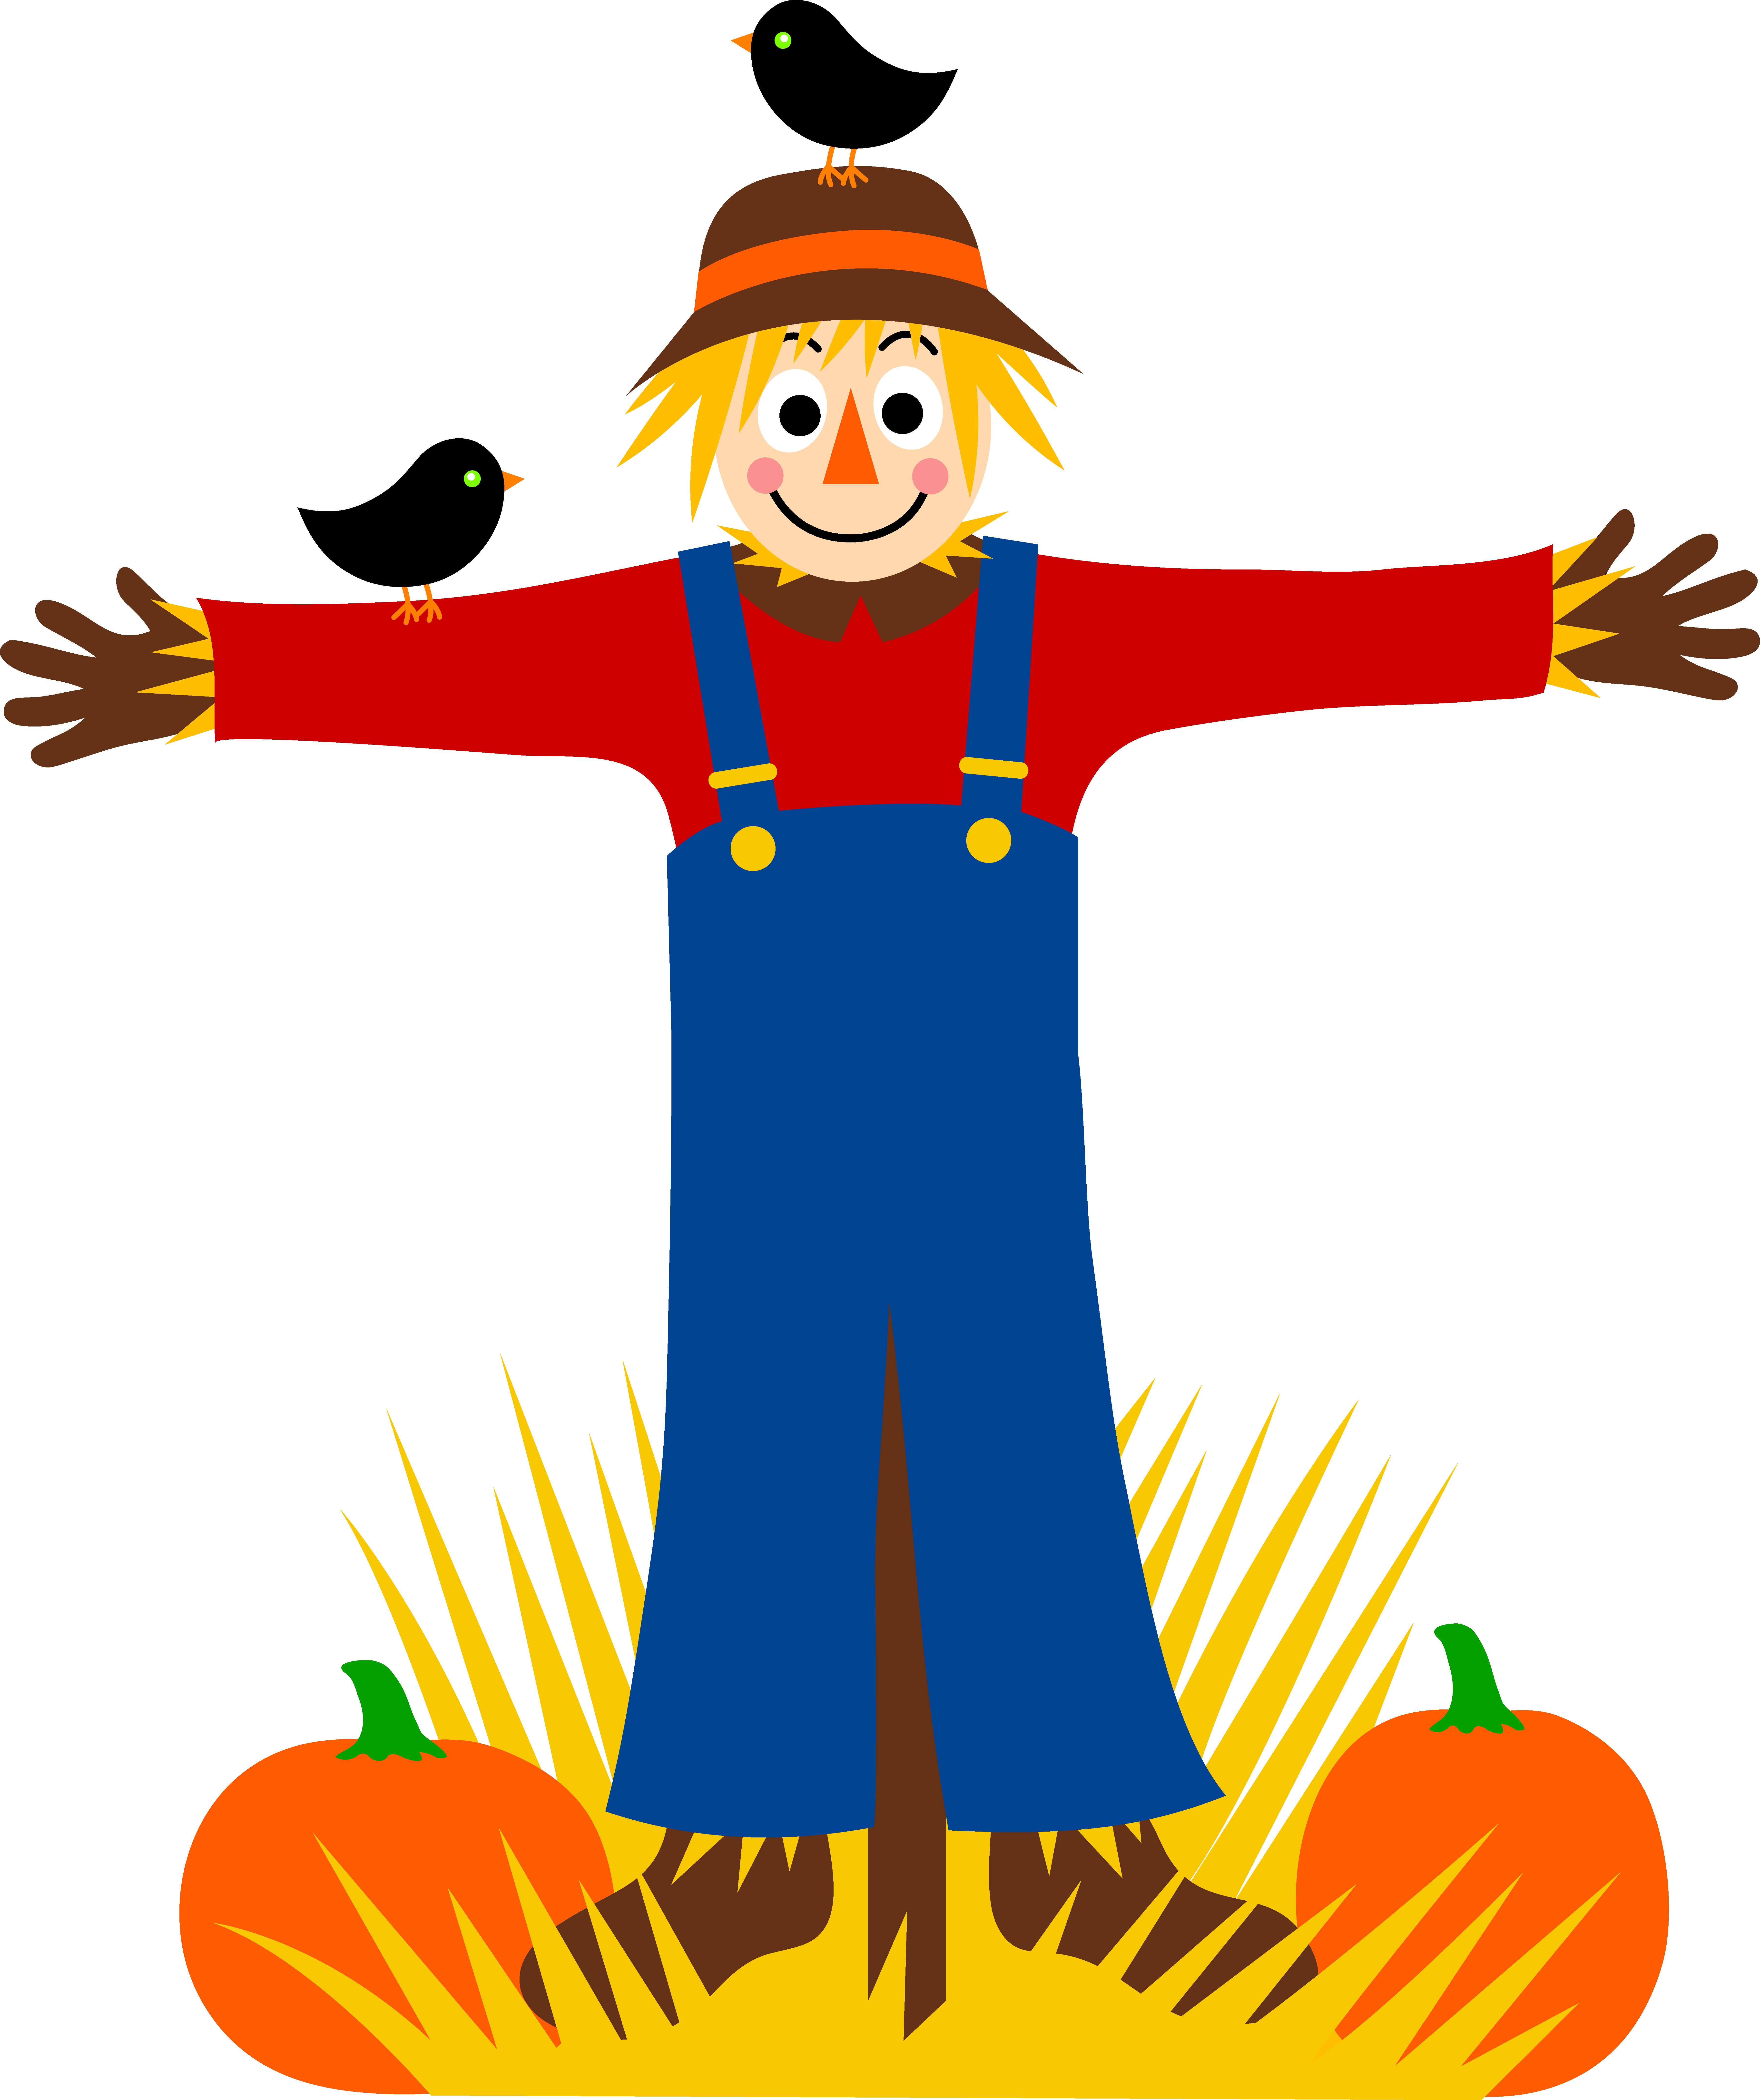 Scarecrow cliparts-Scarecrow cliparts-15